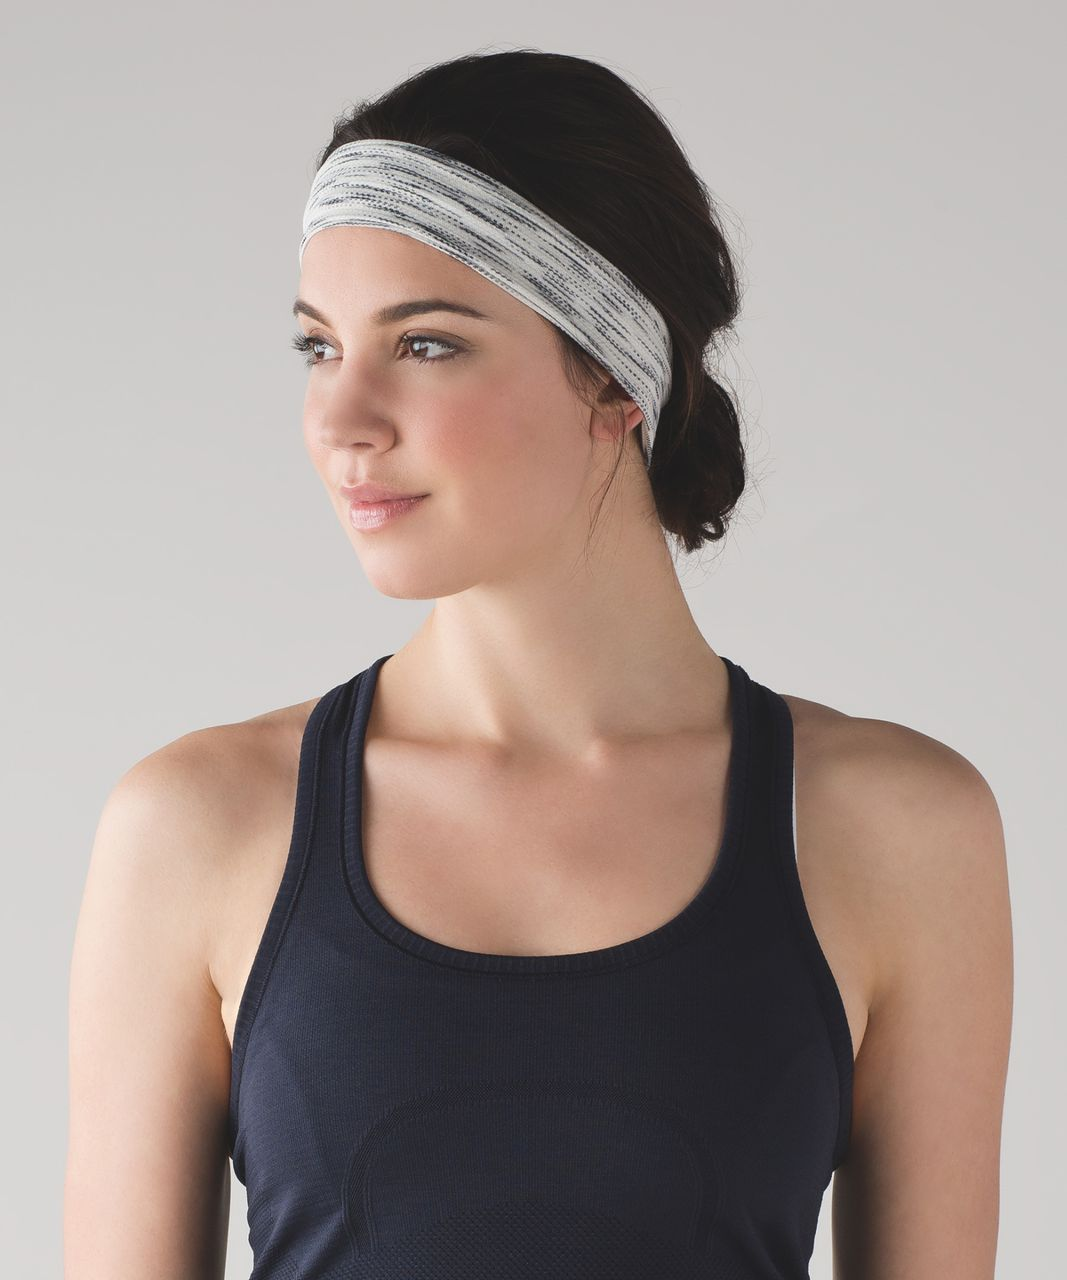 Lululemon Fringe Fighter Headband - Tiger Space Dye Black White / Tiger Space Dye Black White